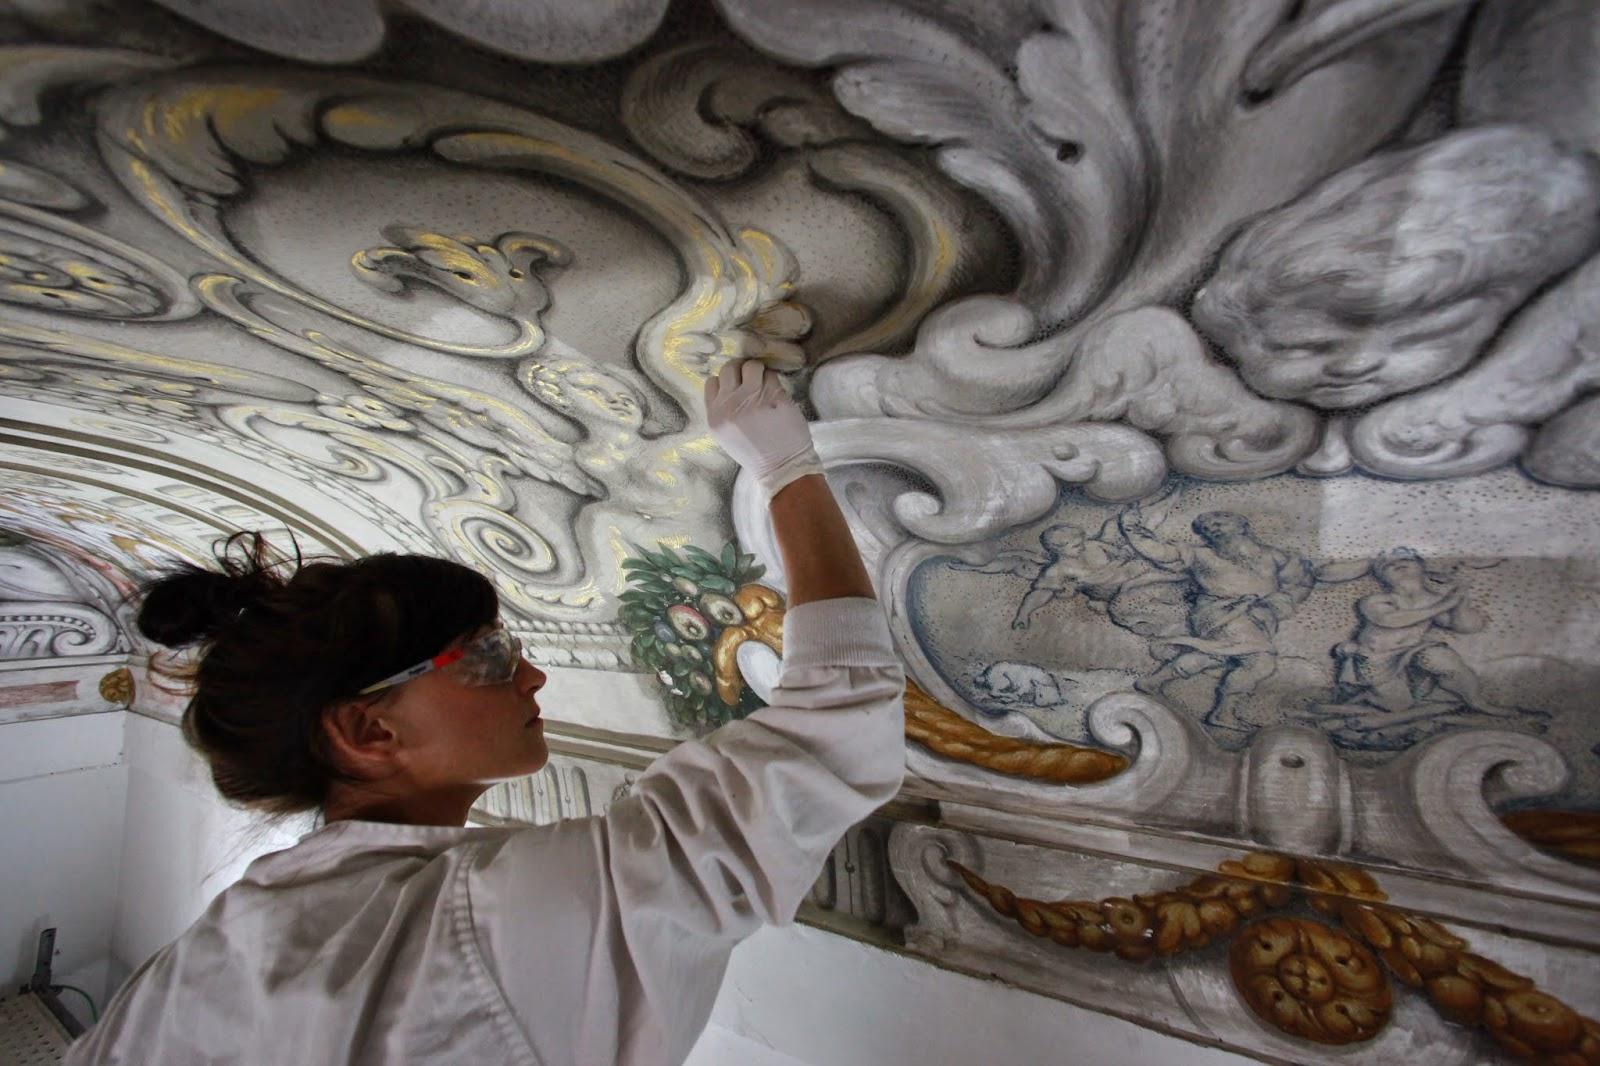 Restauraci n de obras de arte la pintura mural parte 1 for 5 tecnicas de la arquitectura